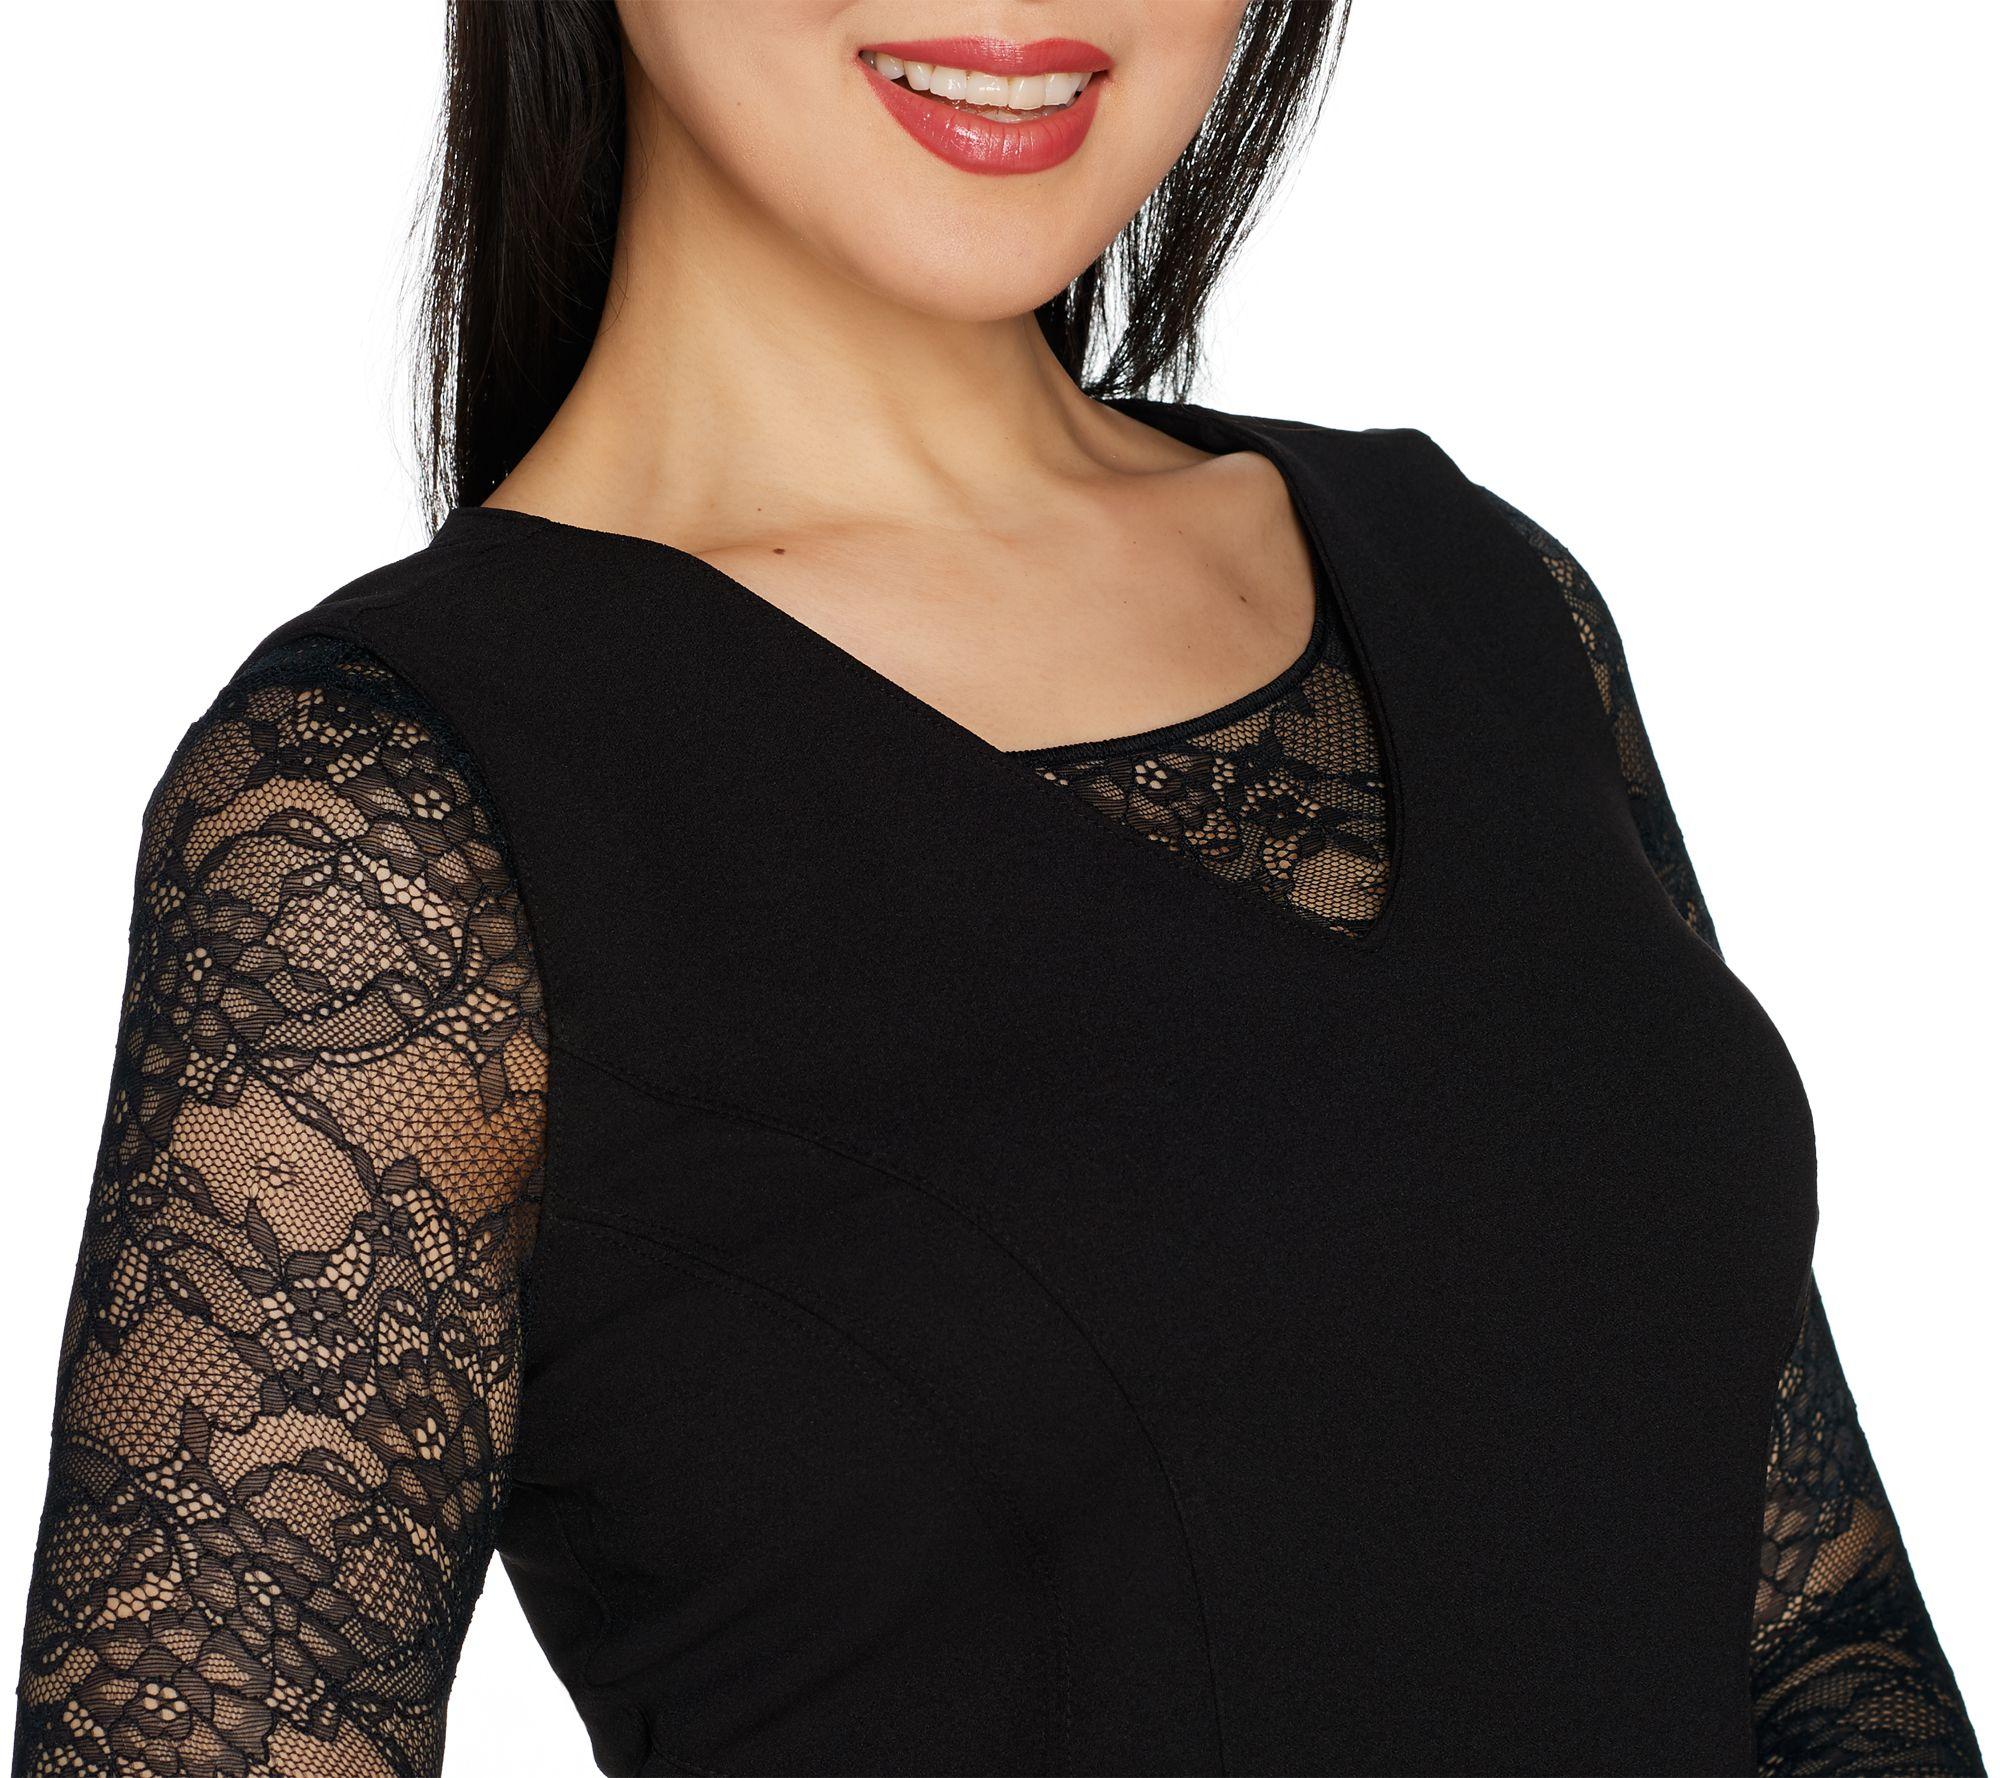 8976ff1c2946a Spanx Sheer Fashion Long Sleeve Crop Top - Page 1 — QVC.com